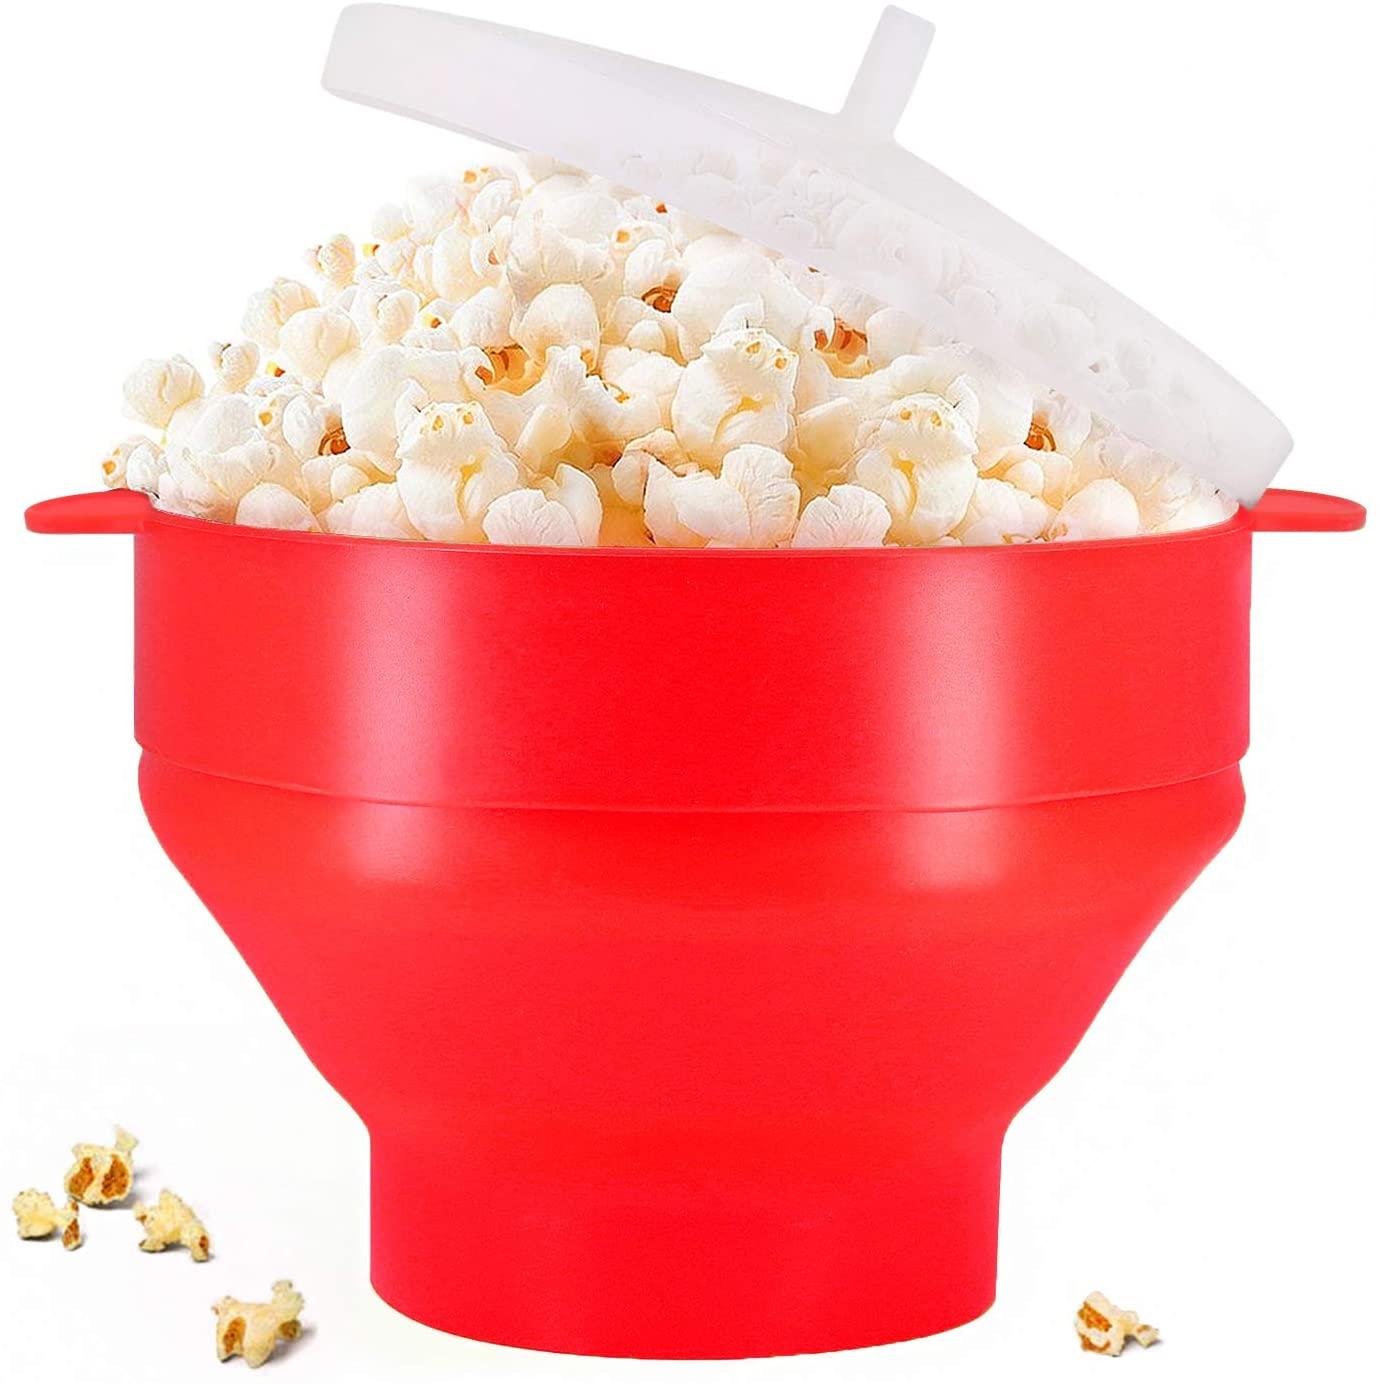 POP STAR - Silicone Popcorn Popper - Red